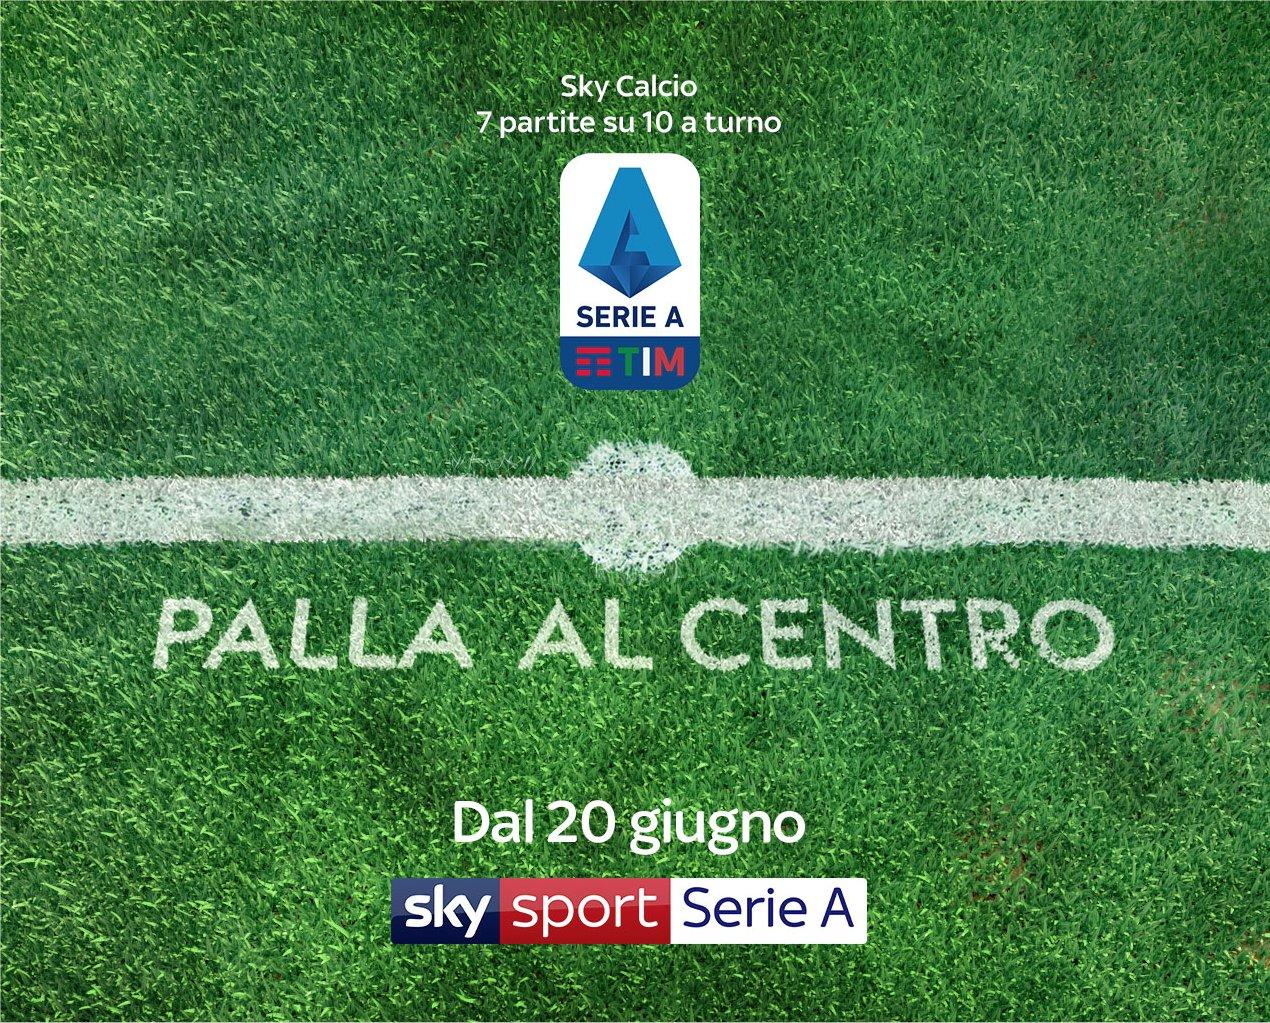 Sky Sport Serie A Recuperi 25a Giornata Diretta Esclusiva Palinsesto Telecronisti Digital News